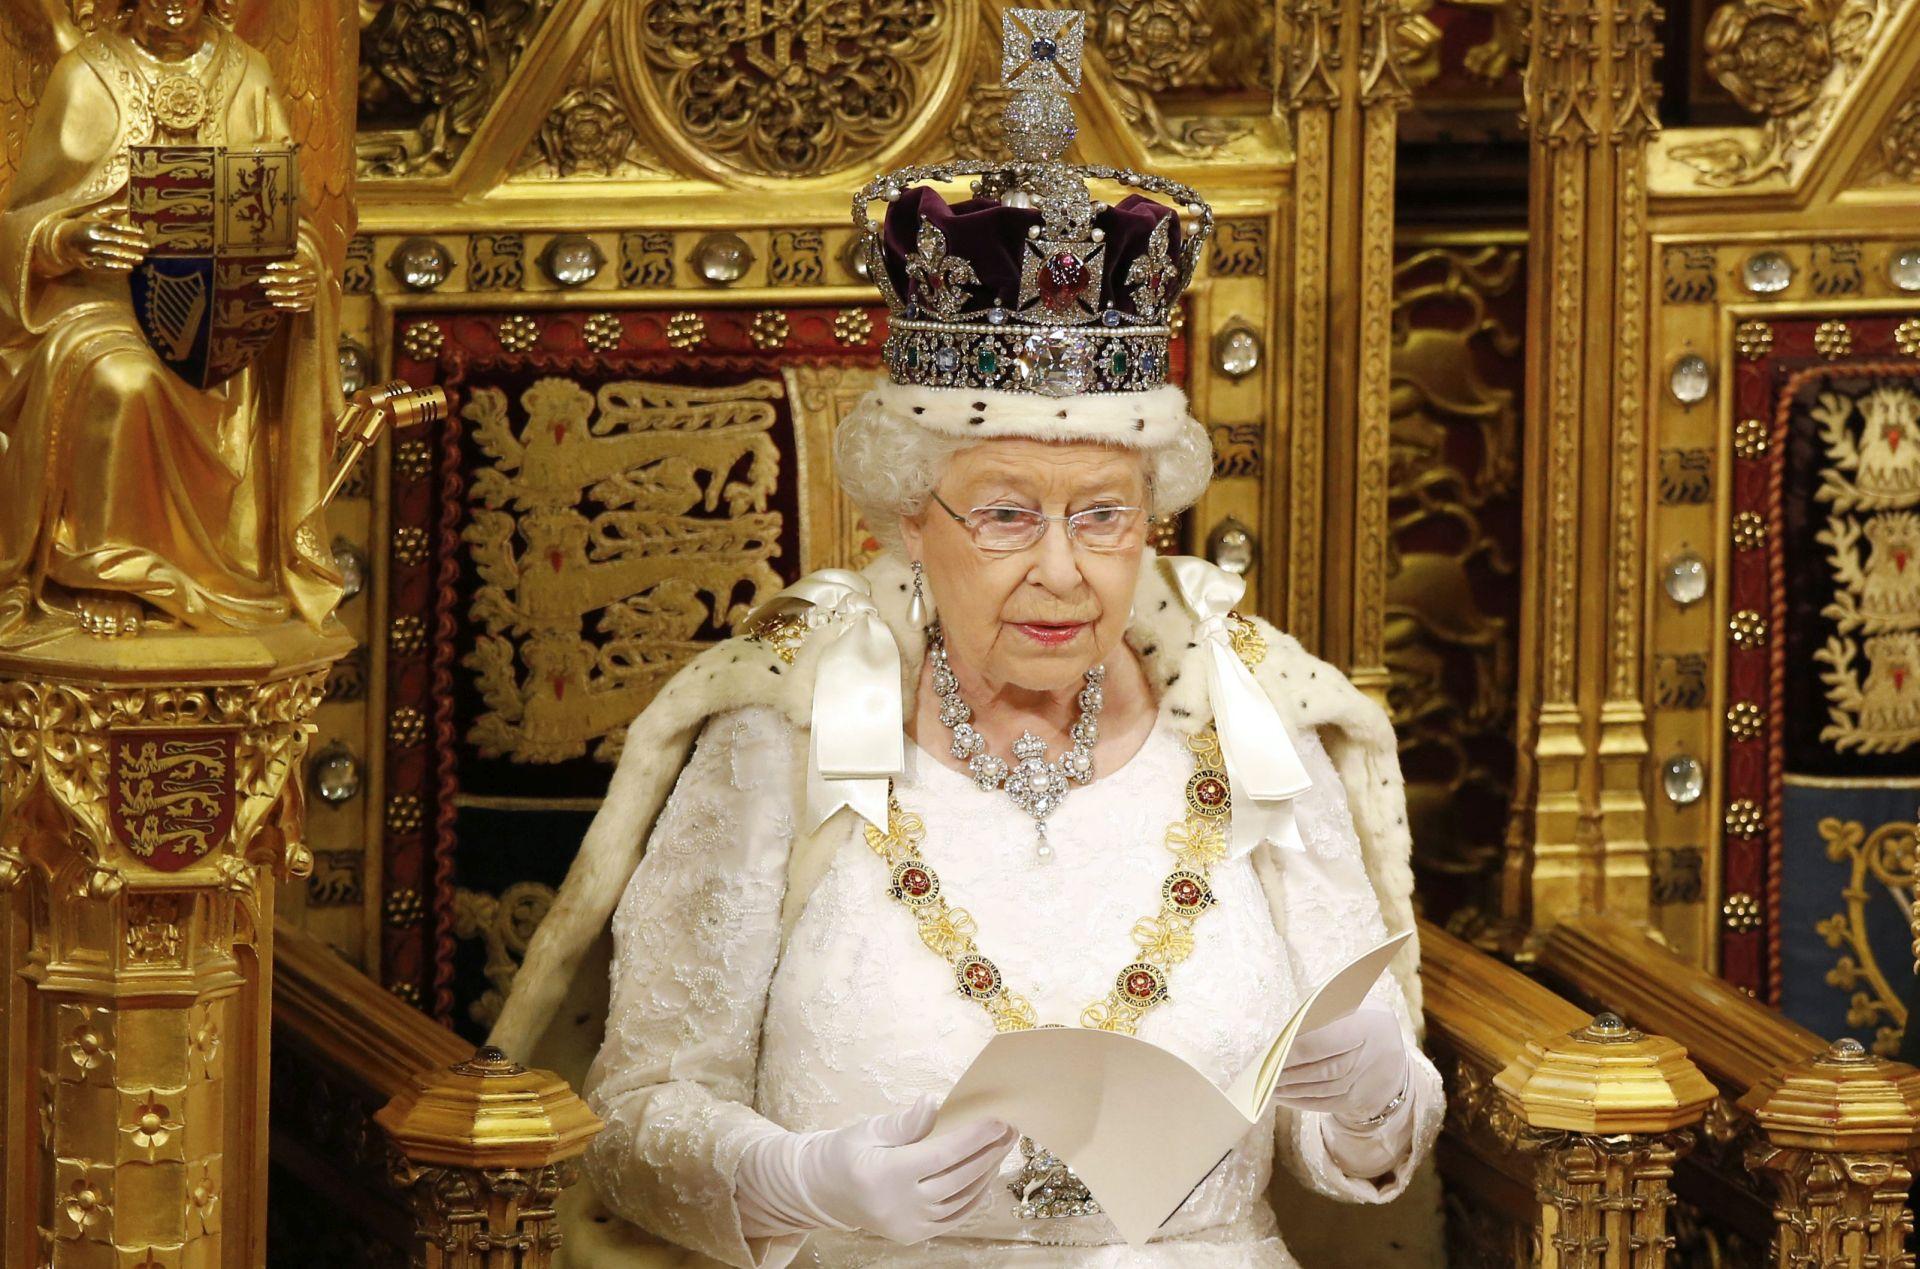 Britanska kraljica predstavila vladine reforme pred referendum o EU-u